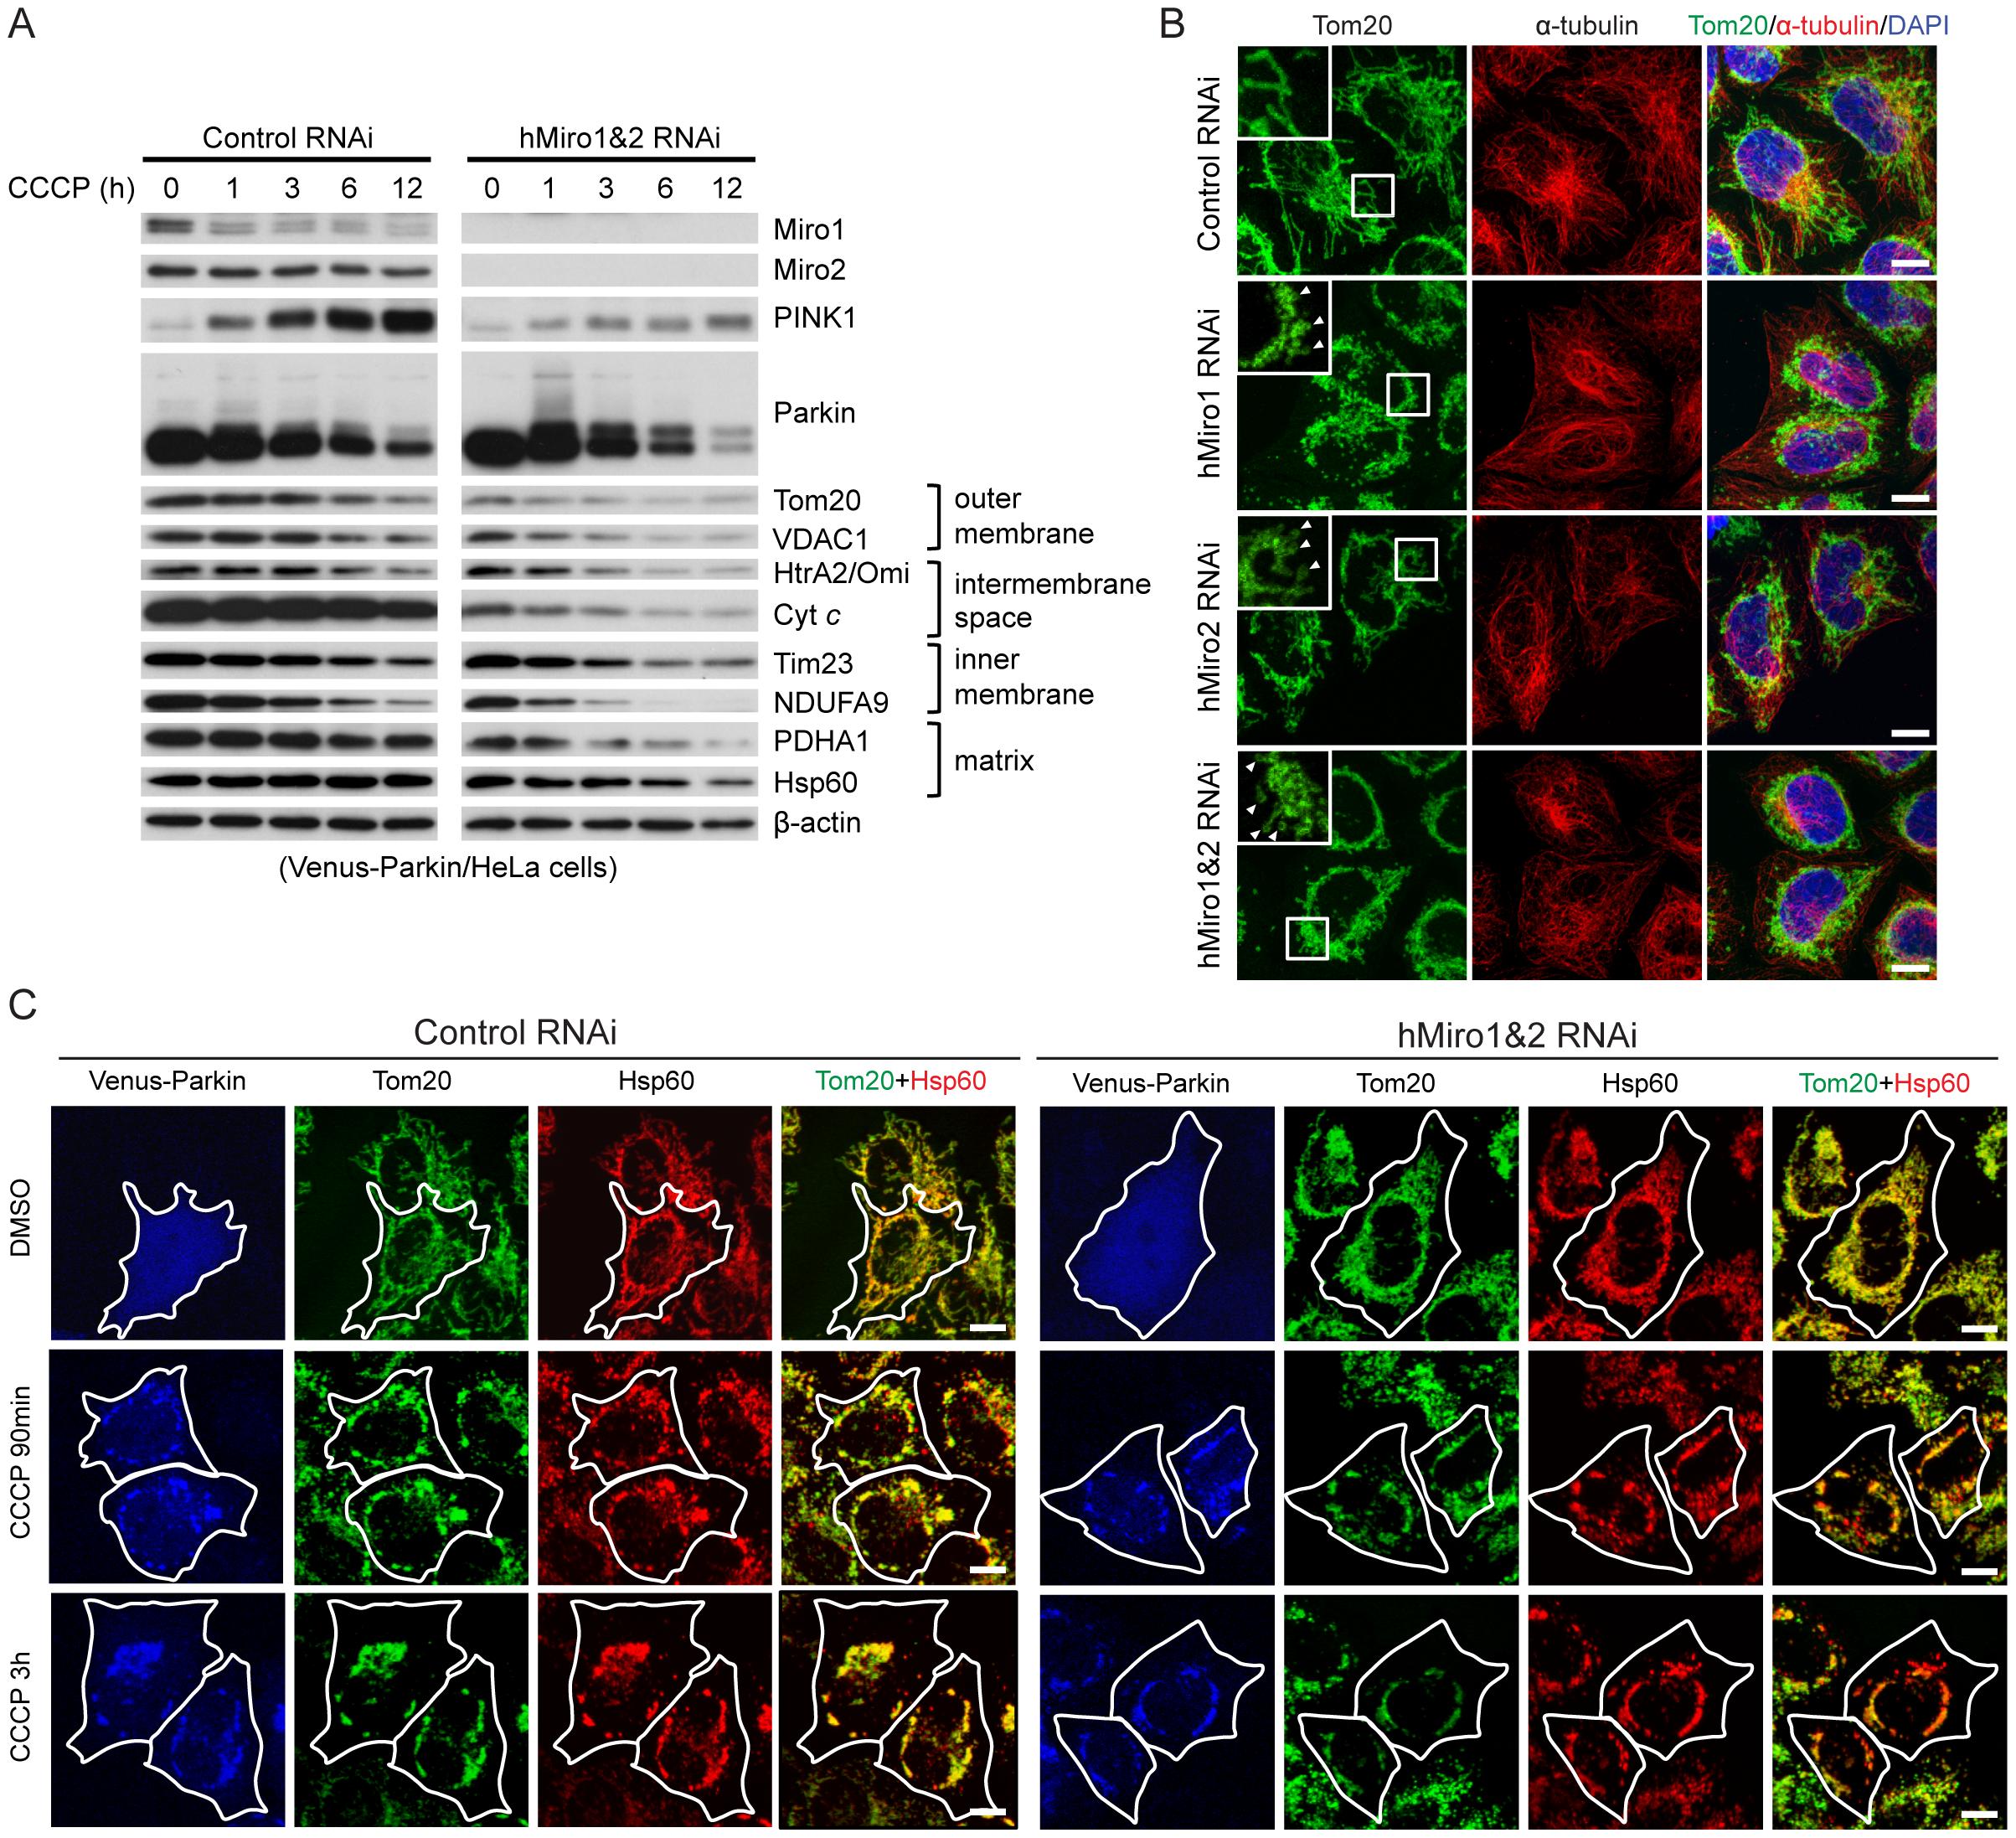 Miro knockdown facilitates the removal of damaged mitochondria by Parkin-mediated mitophagy.